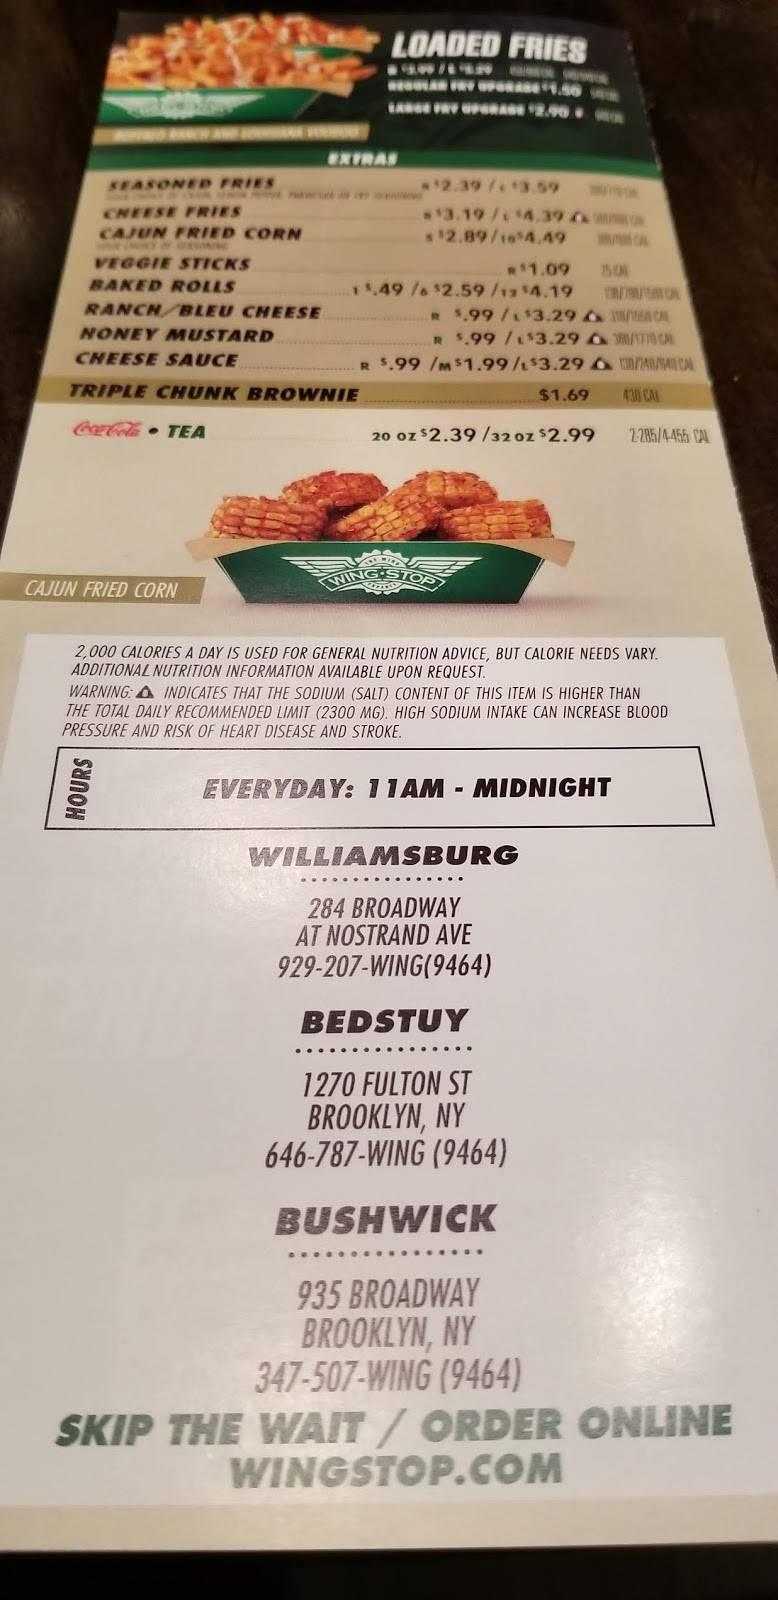 Wingstop | restaurant | 284 Broadway, Williamsburg, NY 11211, USA | 9292079464 OR +1 929-207-9464